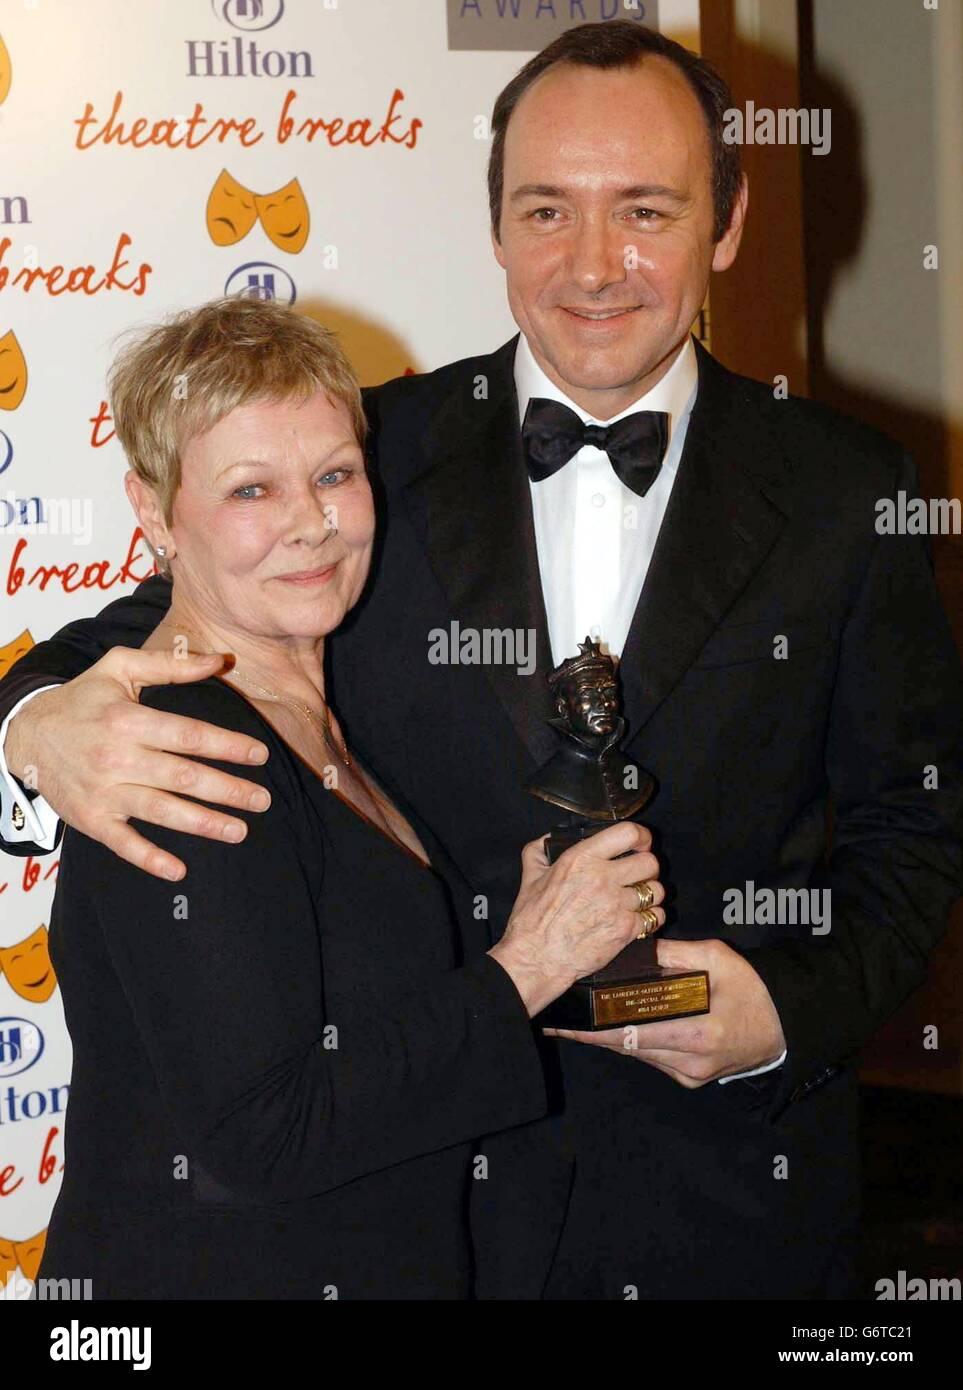 Judi Dench - Olivier Awards 2004 - London Hilton Stockfoto